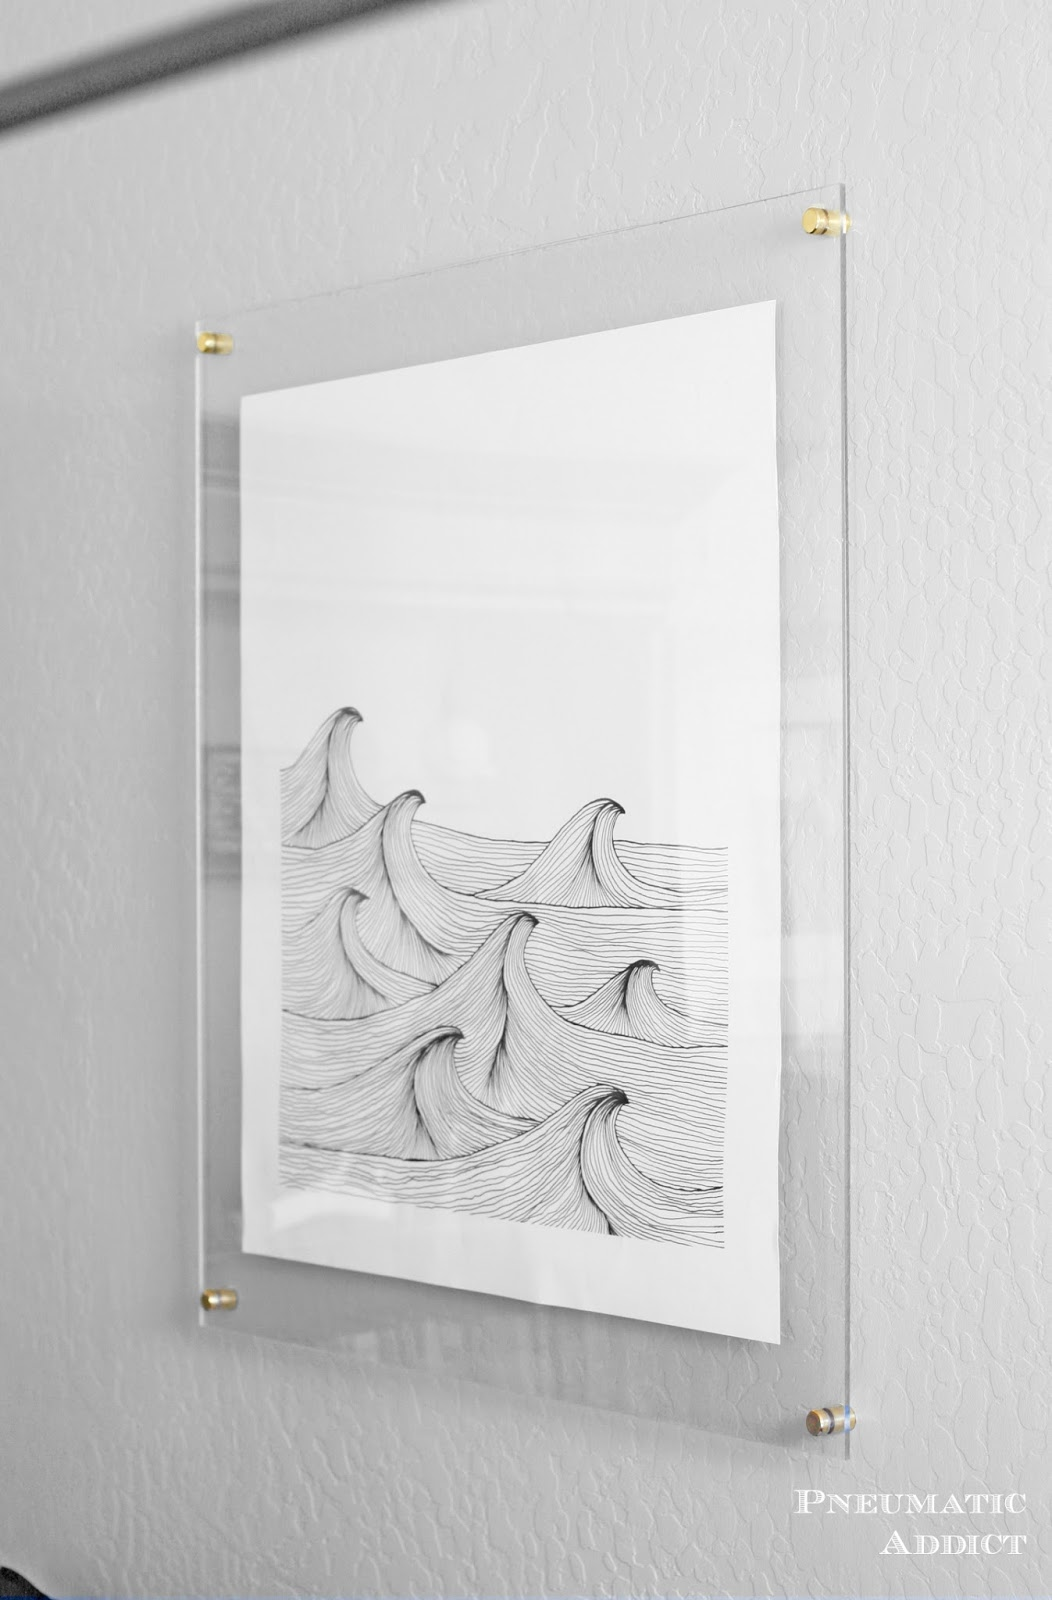 Pneumatic addict frameless floating art tutorial jeuxipadfo Image collections